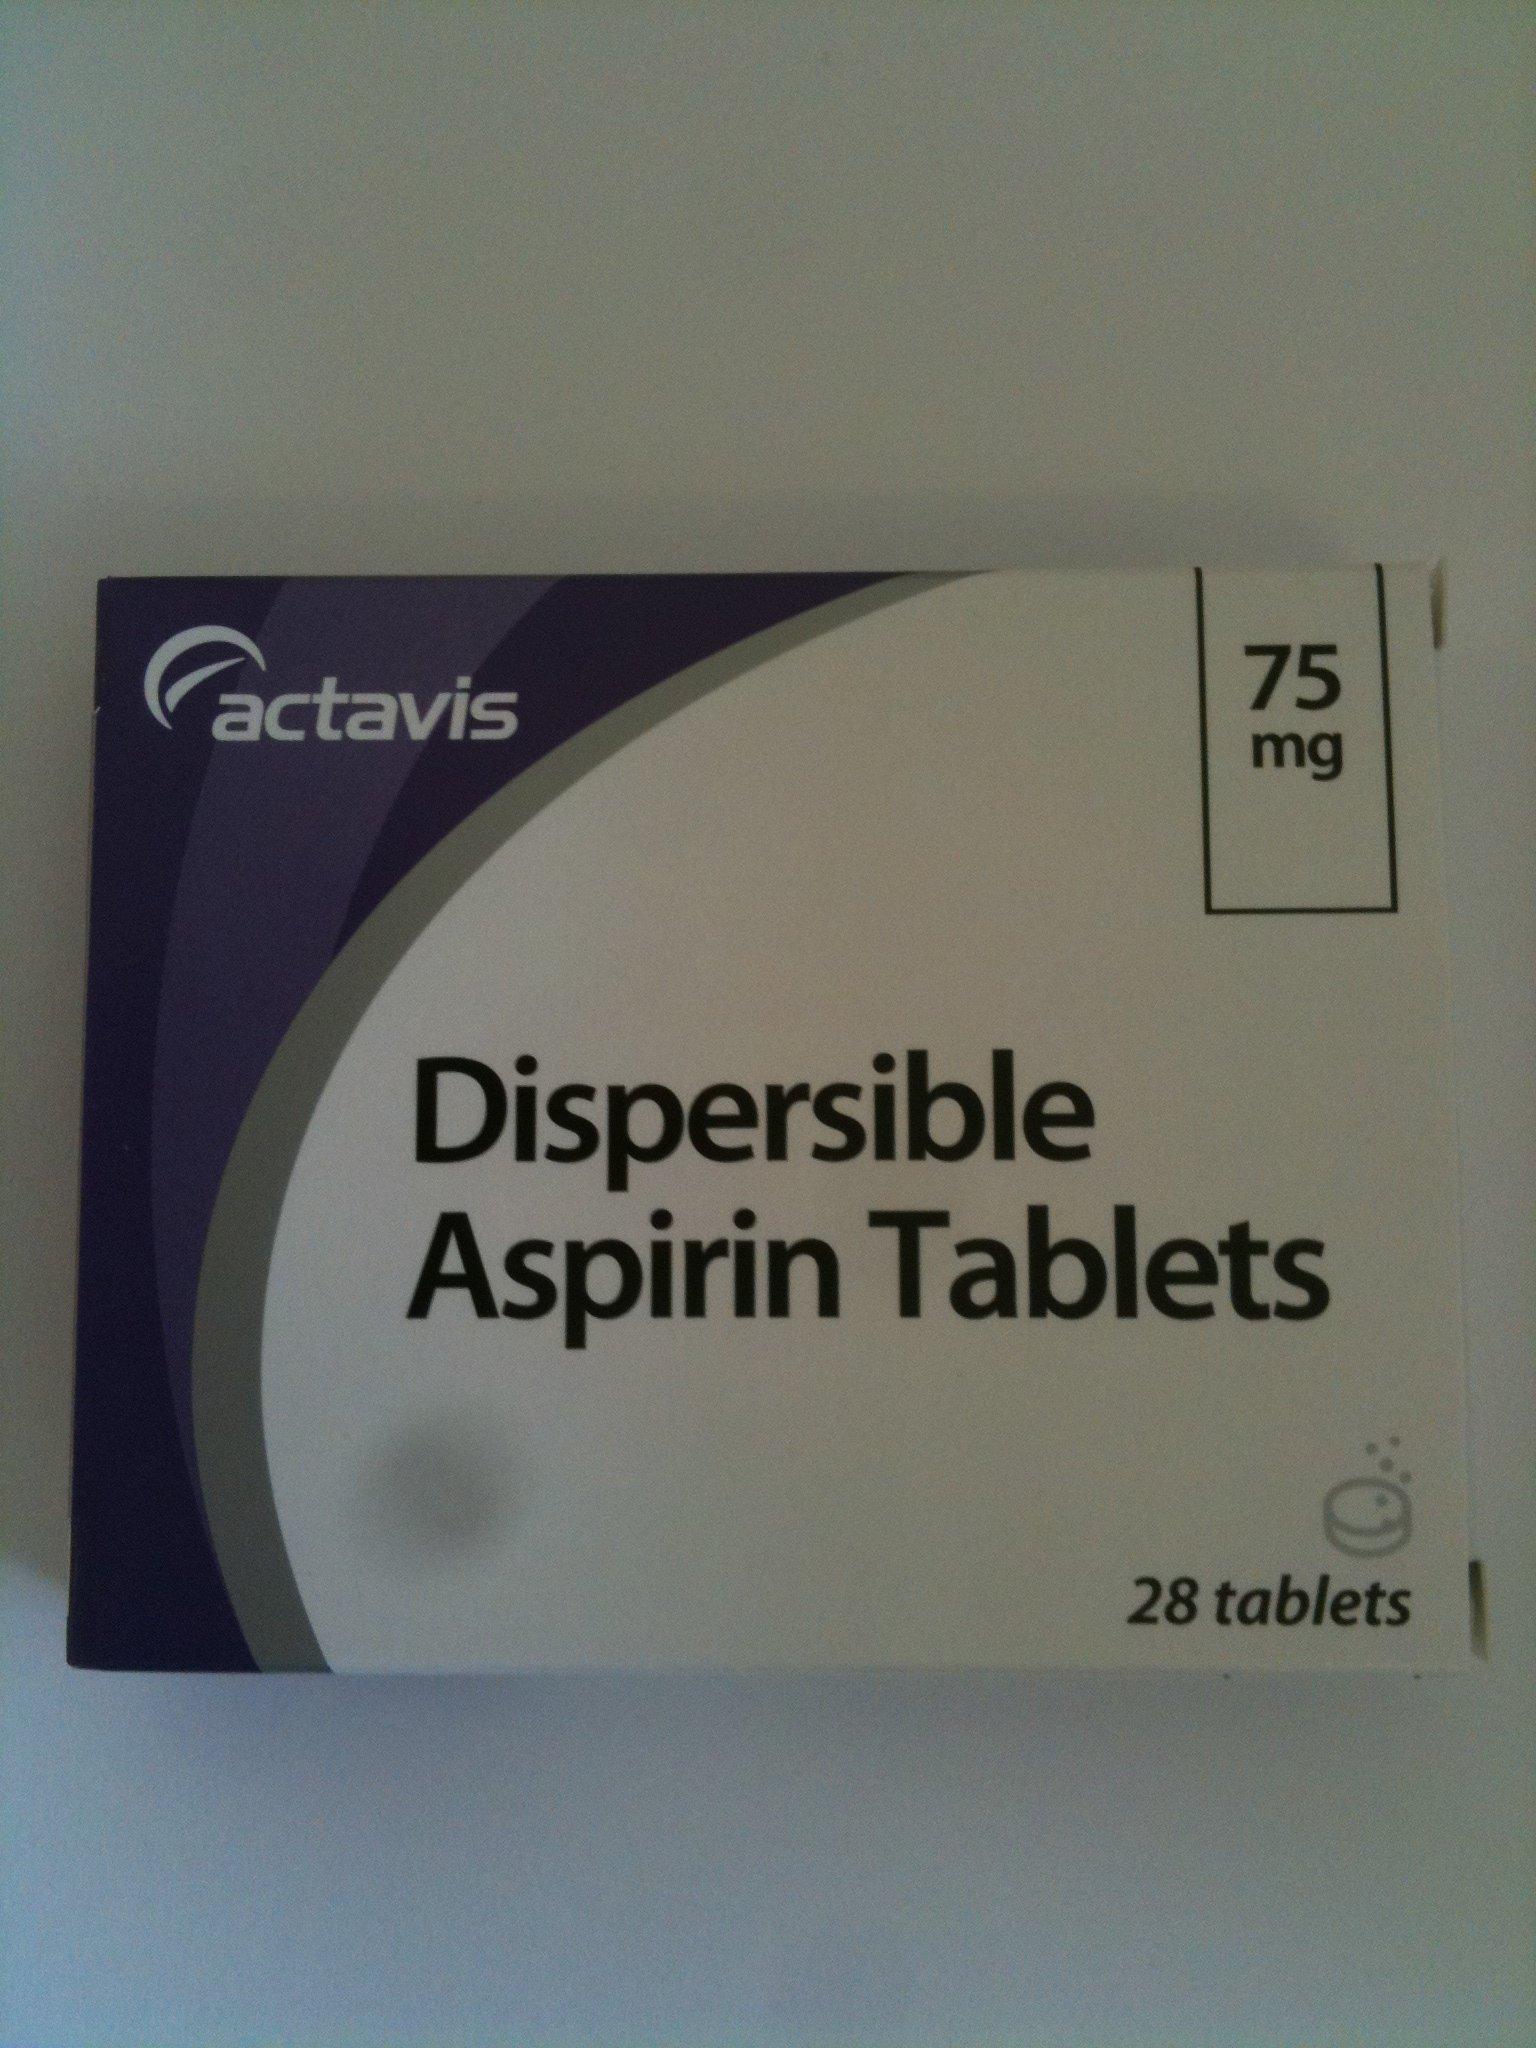 Aspirin Dispersible 75mg (Low Dose)